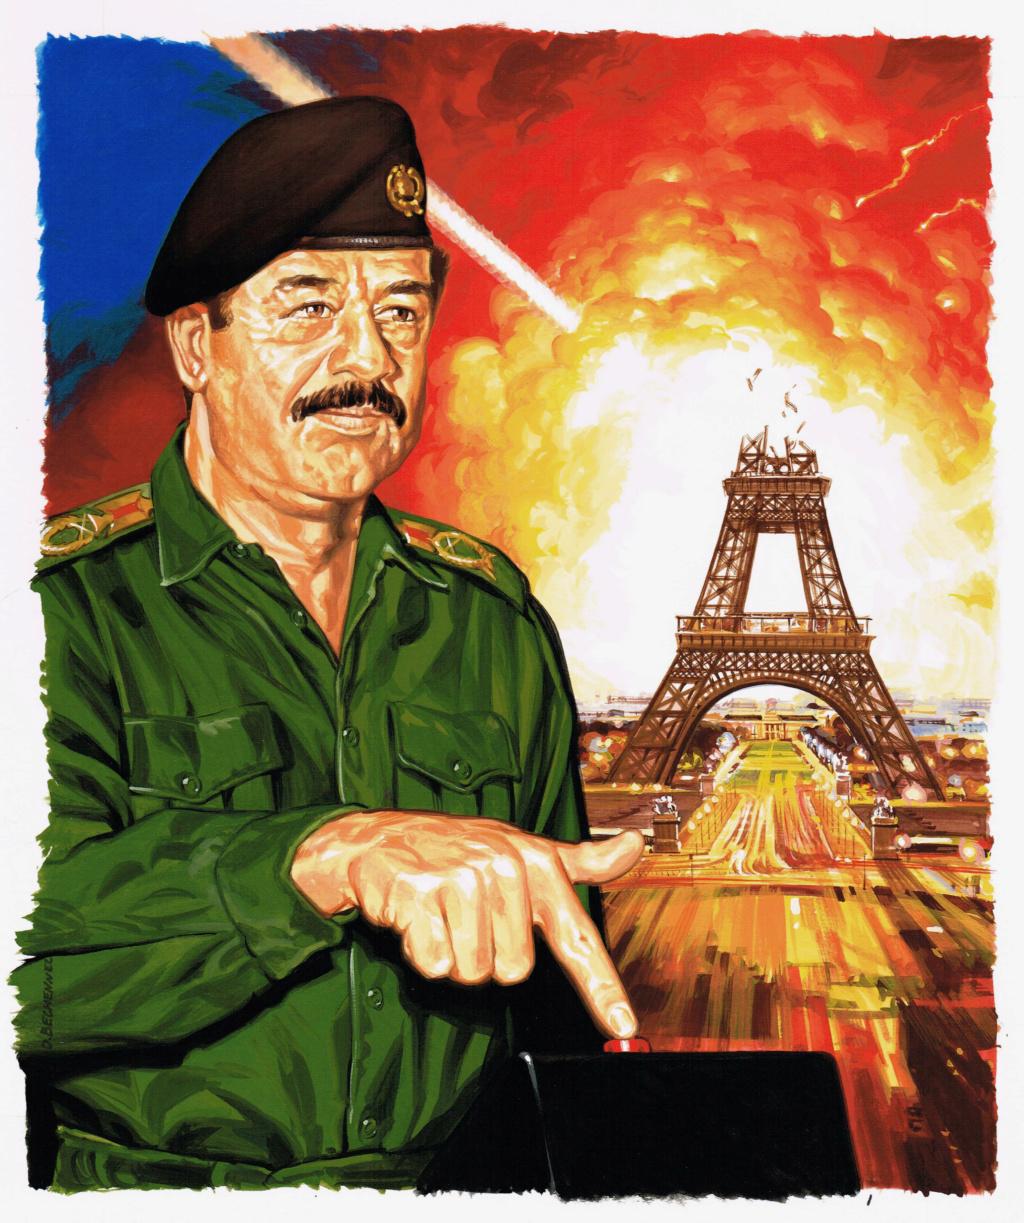 ILLUSTRATIONS DIVERSES. - Page 10 Saddam10